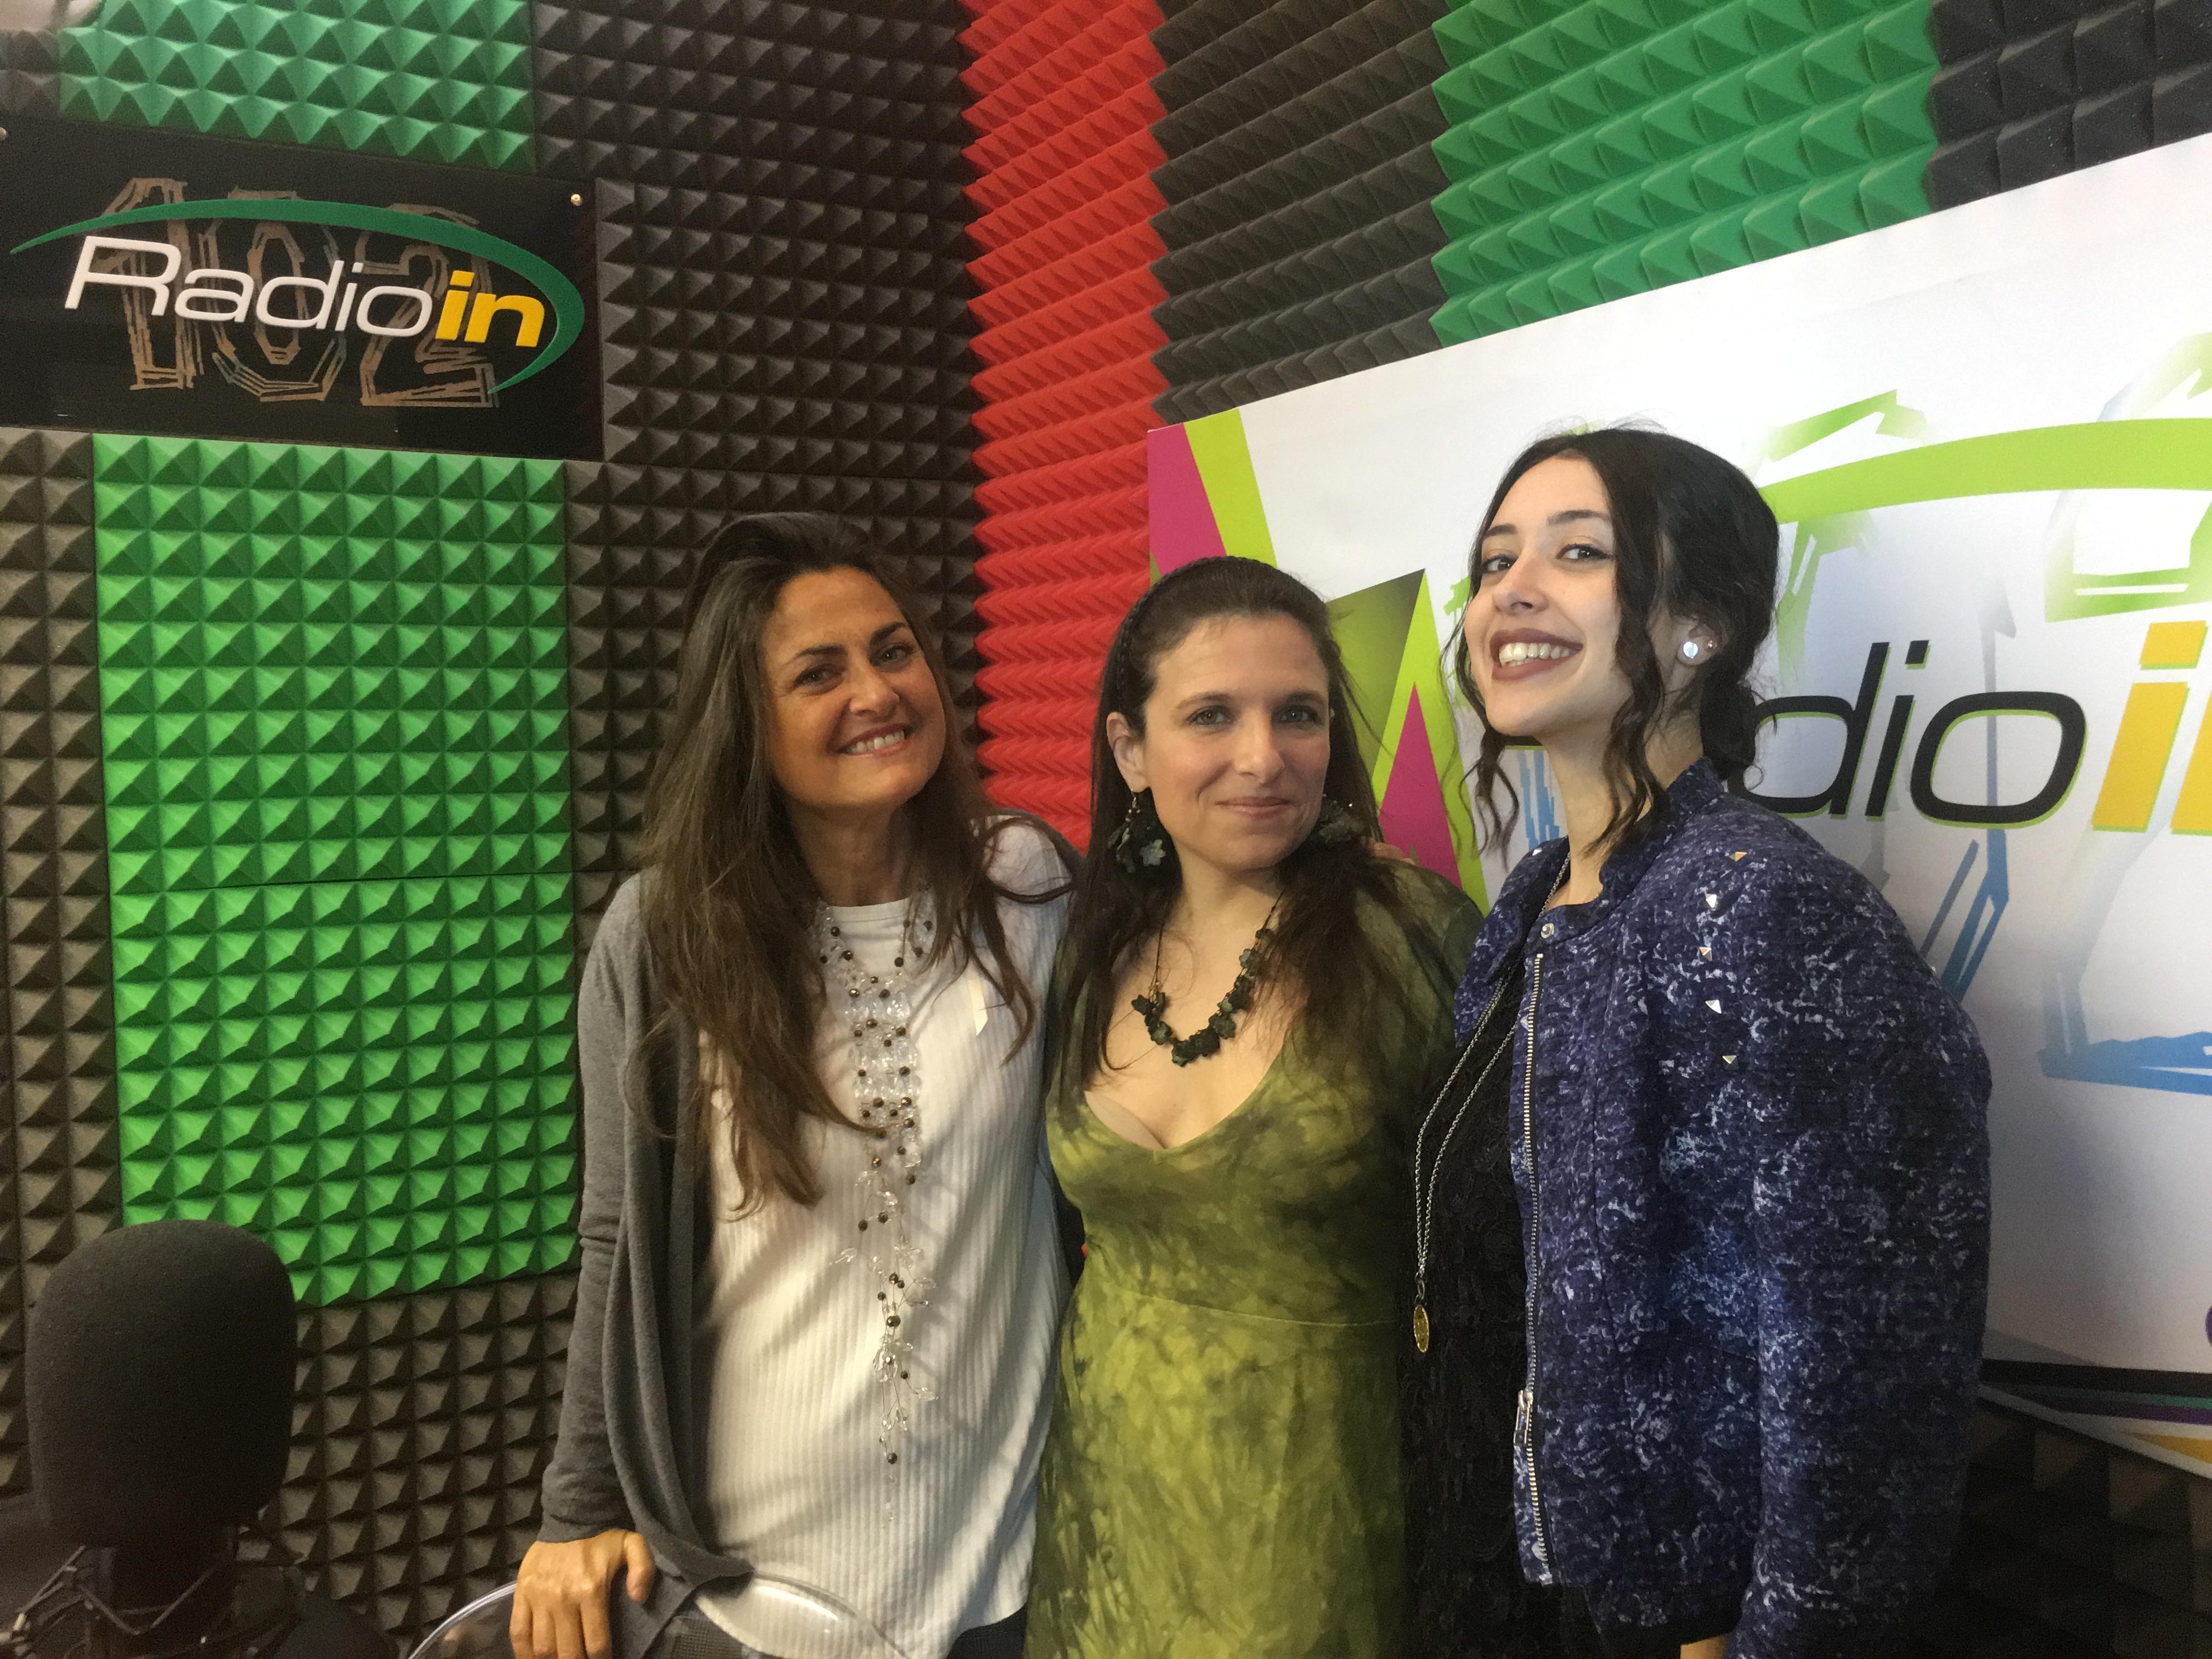 Milvia Averna e Sara Priolo con la stilista Roberta Lo Jacono